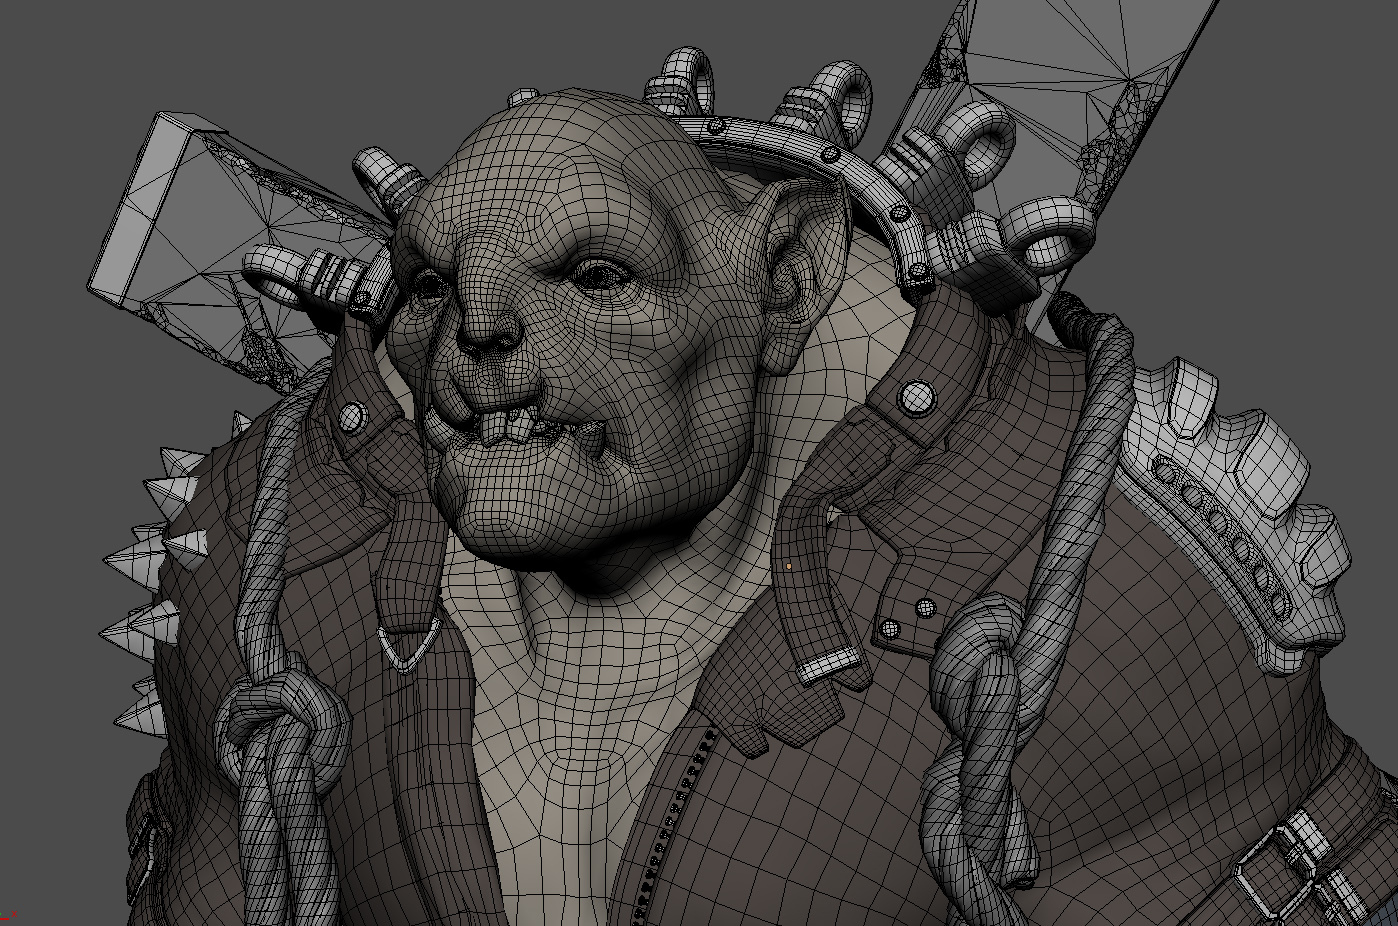 Beast wire1